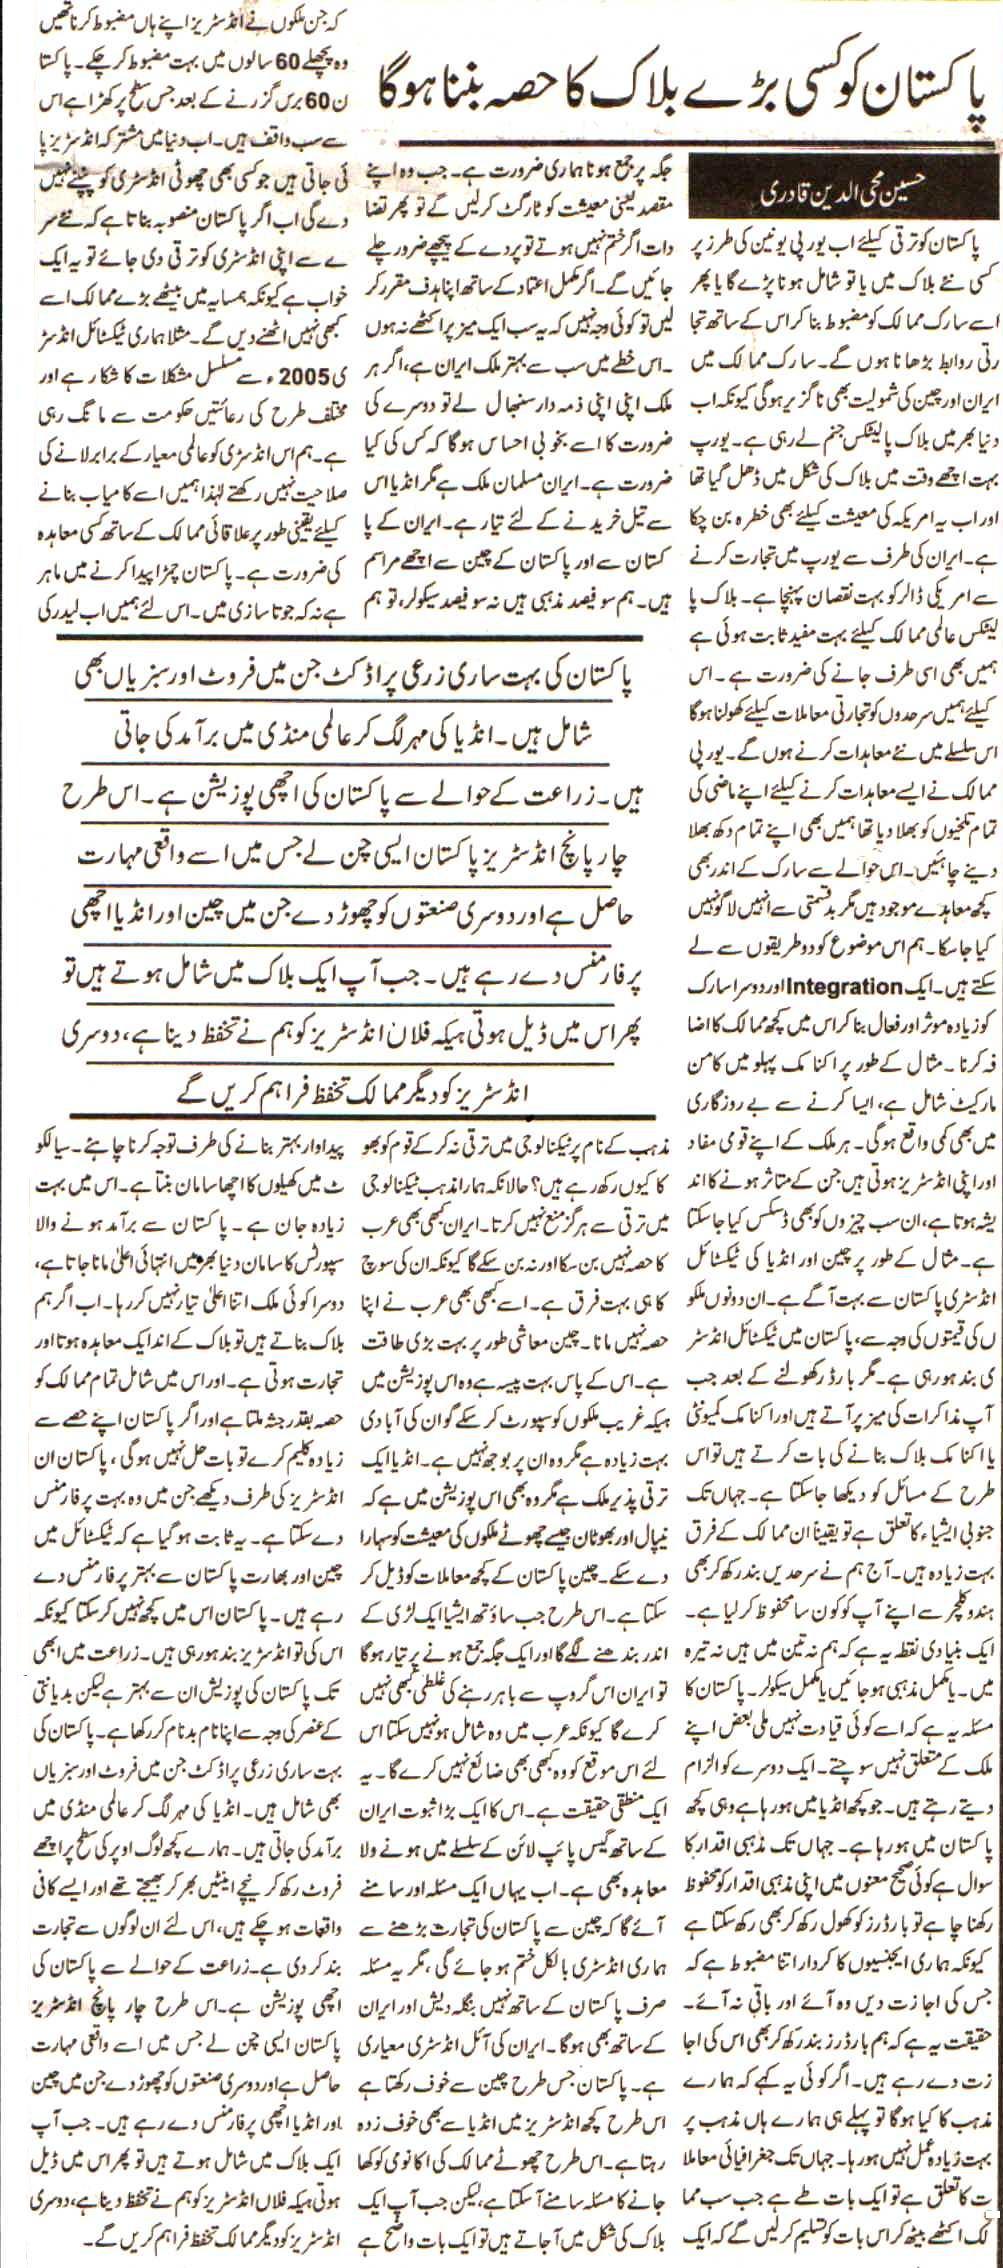 تحریک منہاج القرآن Minhaj-ul-Quran  Print Media Coverage پرنٹ میڈیا کوریج Daily Al.Akhbar